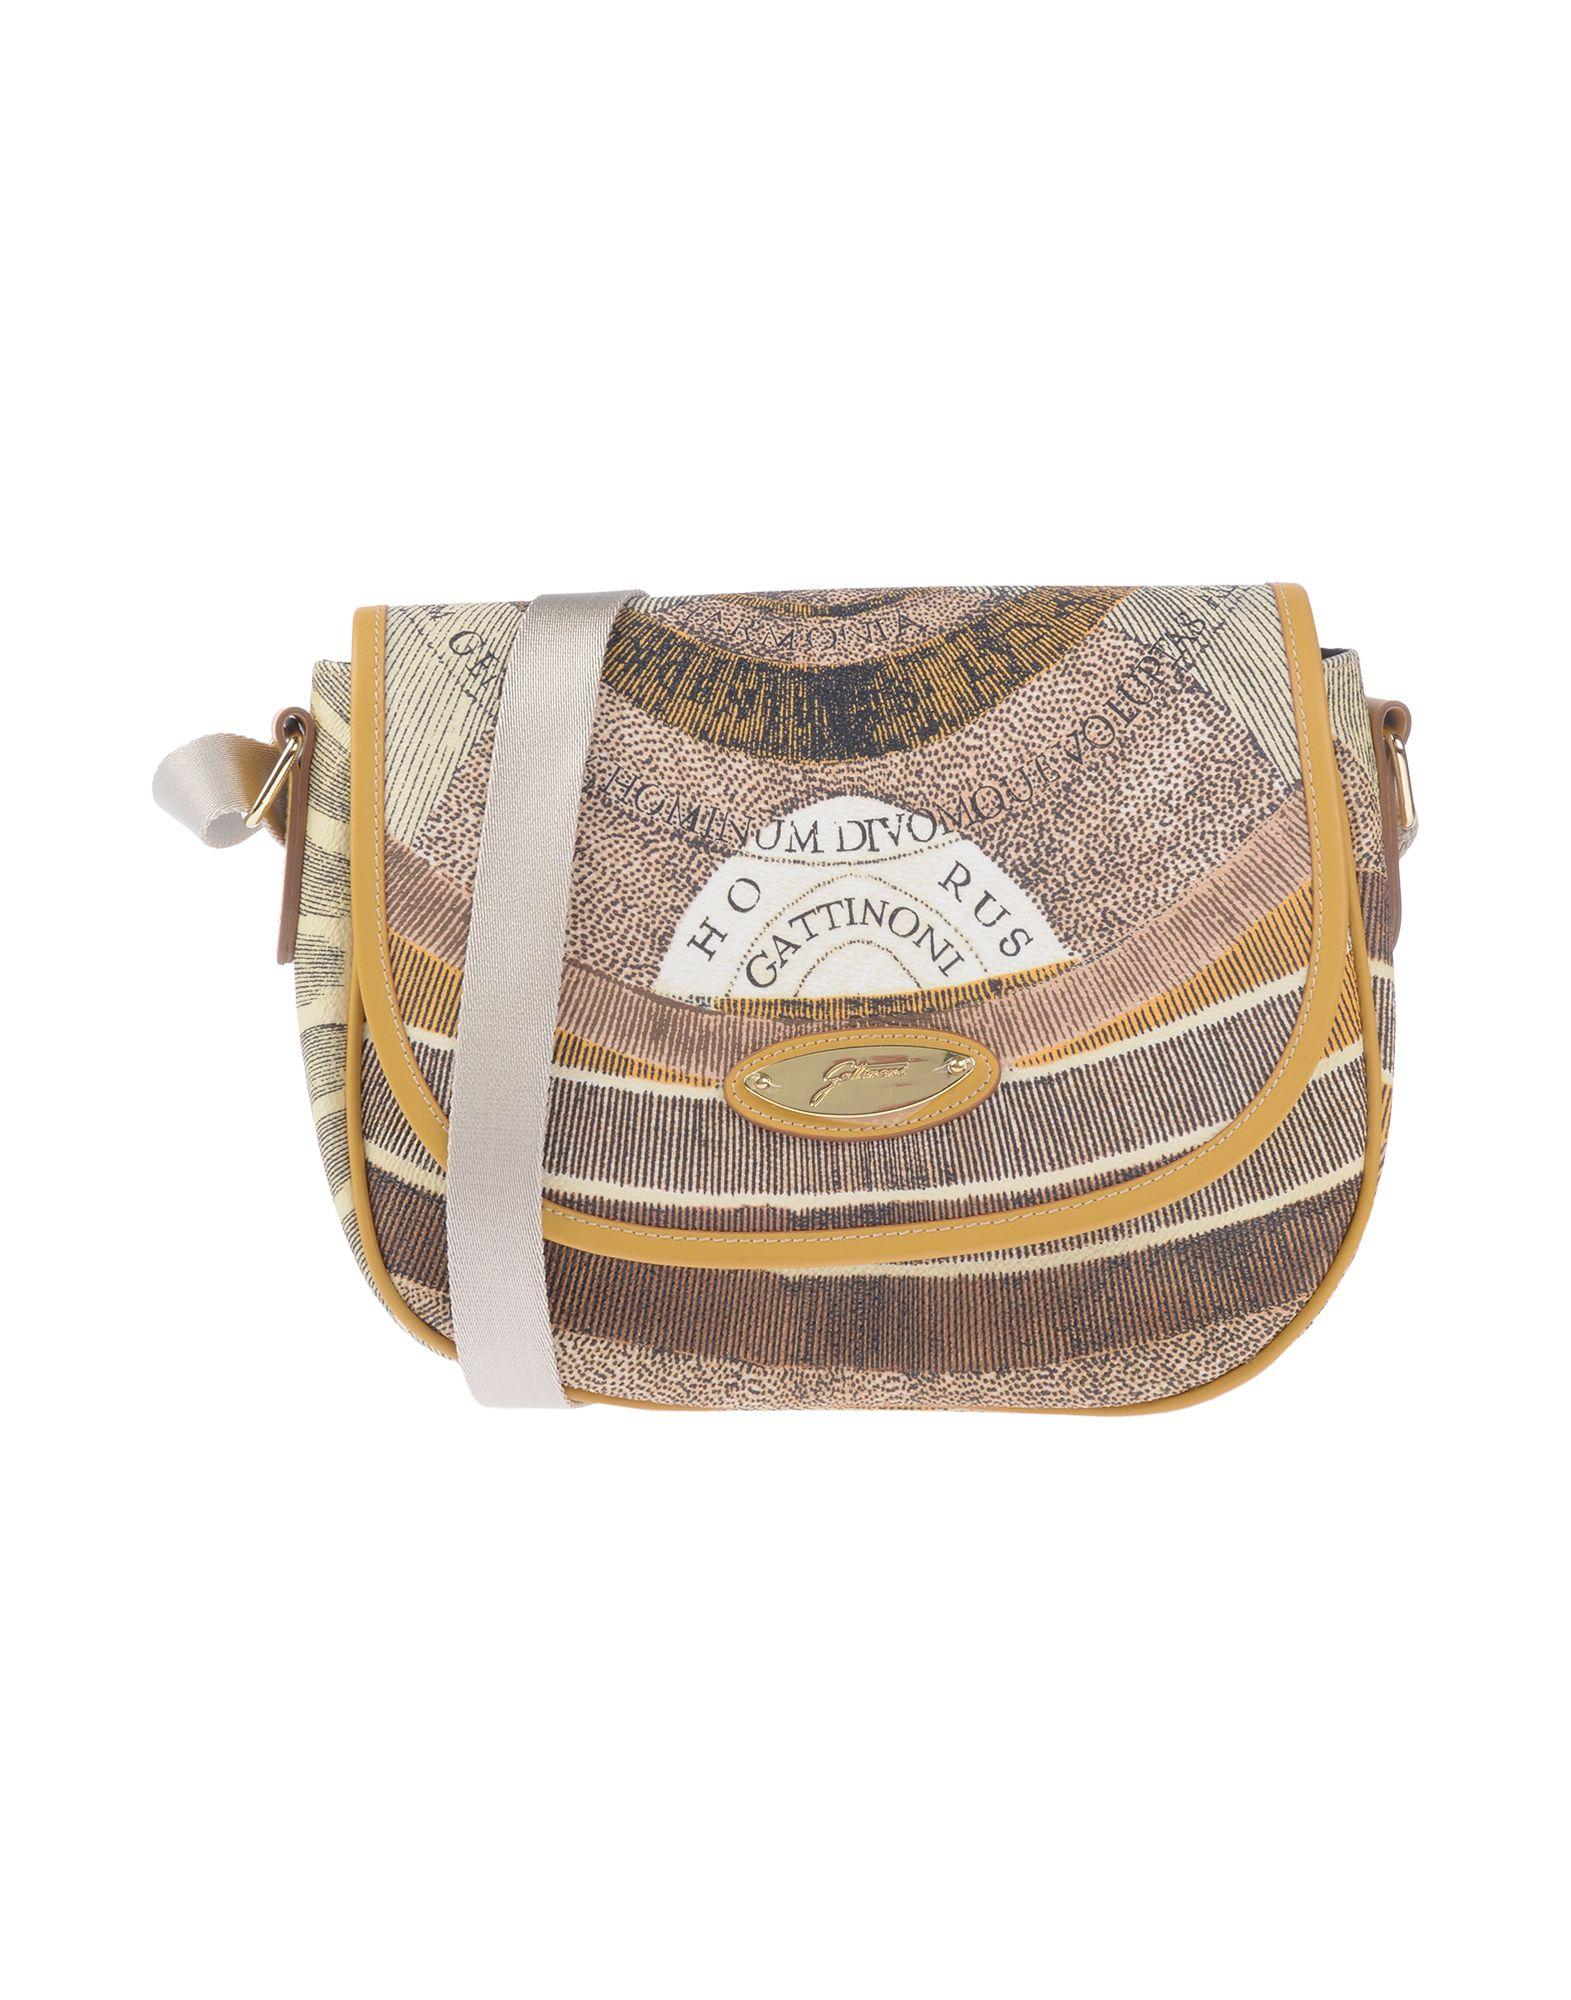 feger мужская сумка через плечо стоячий рюкзак спортивная сумка на поясе GATTINONI Сумка через плечо